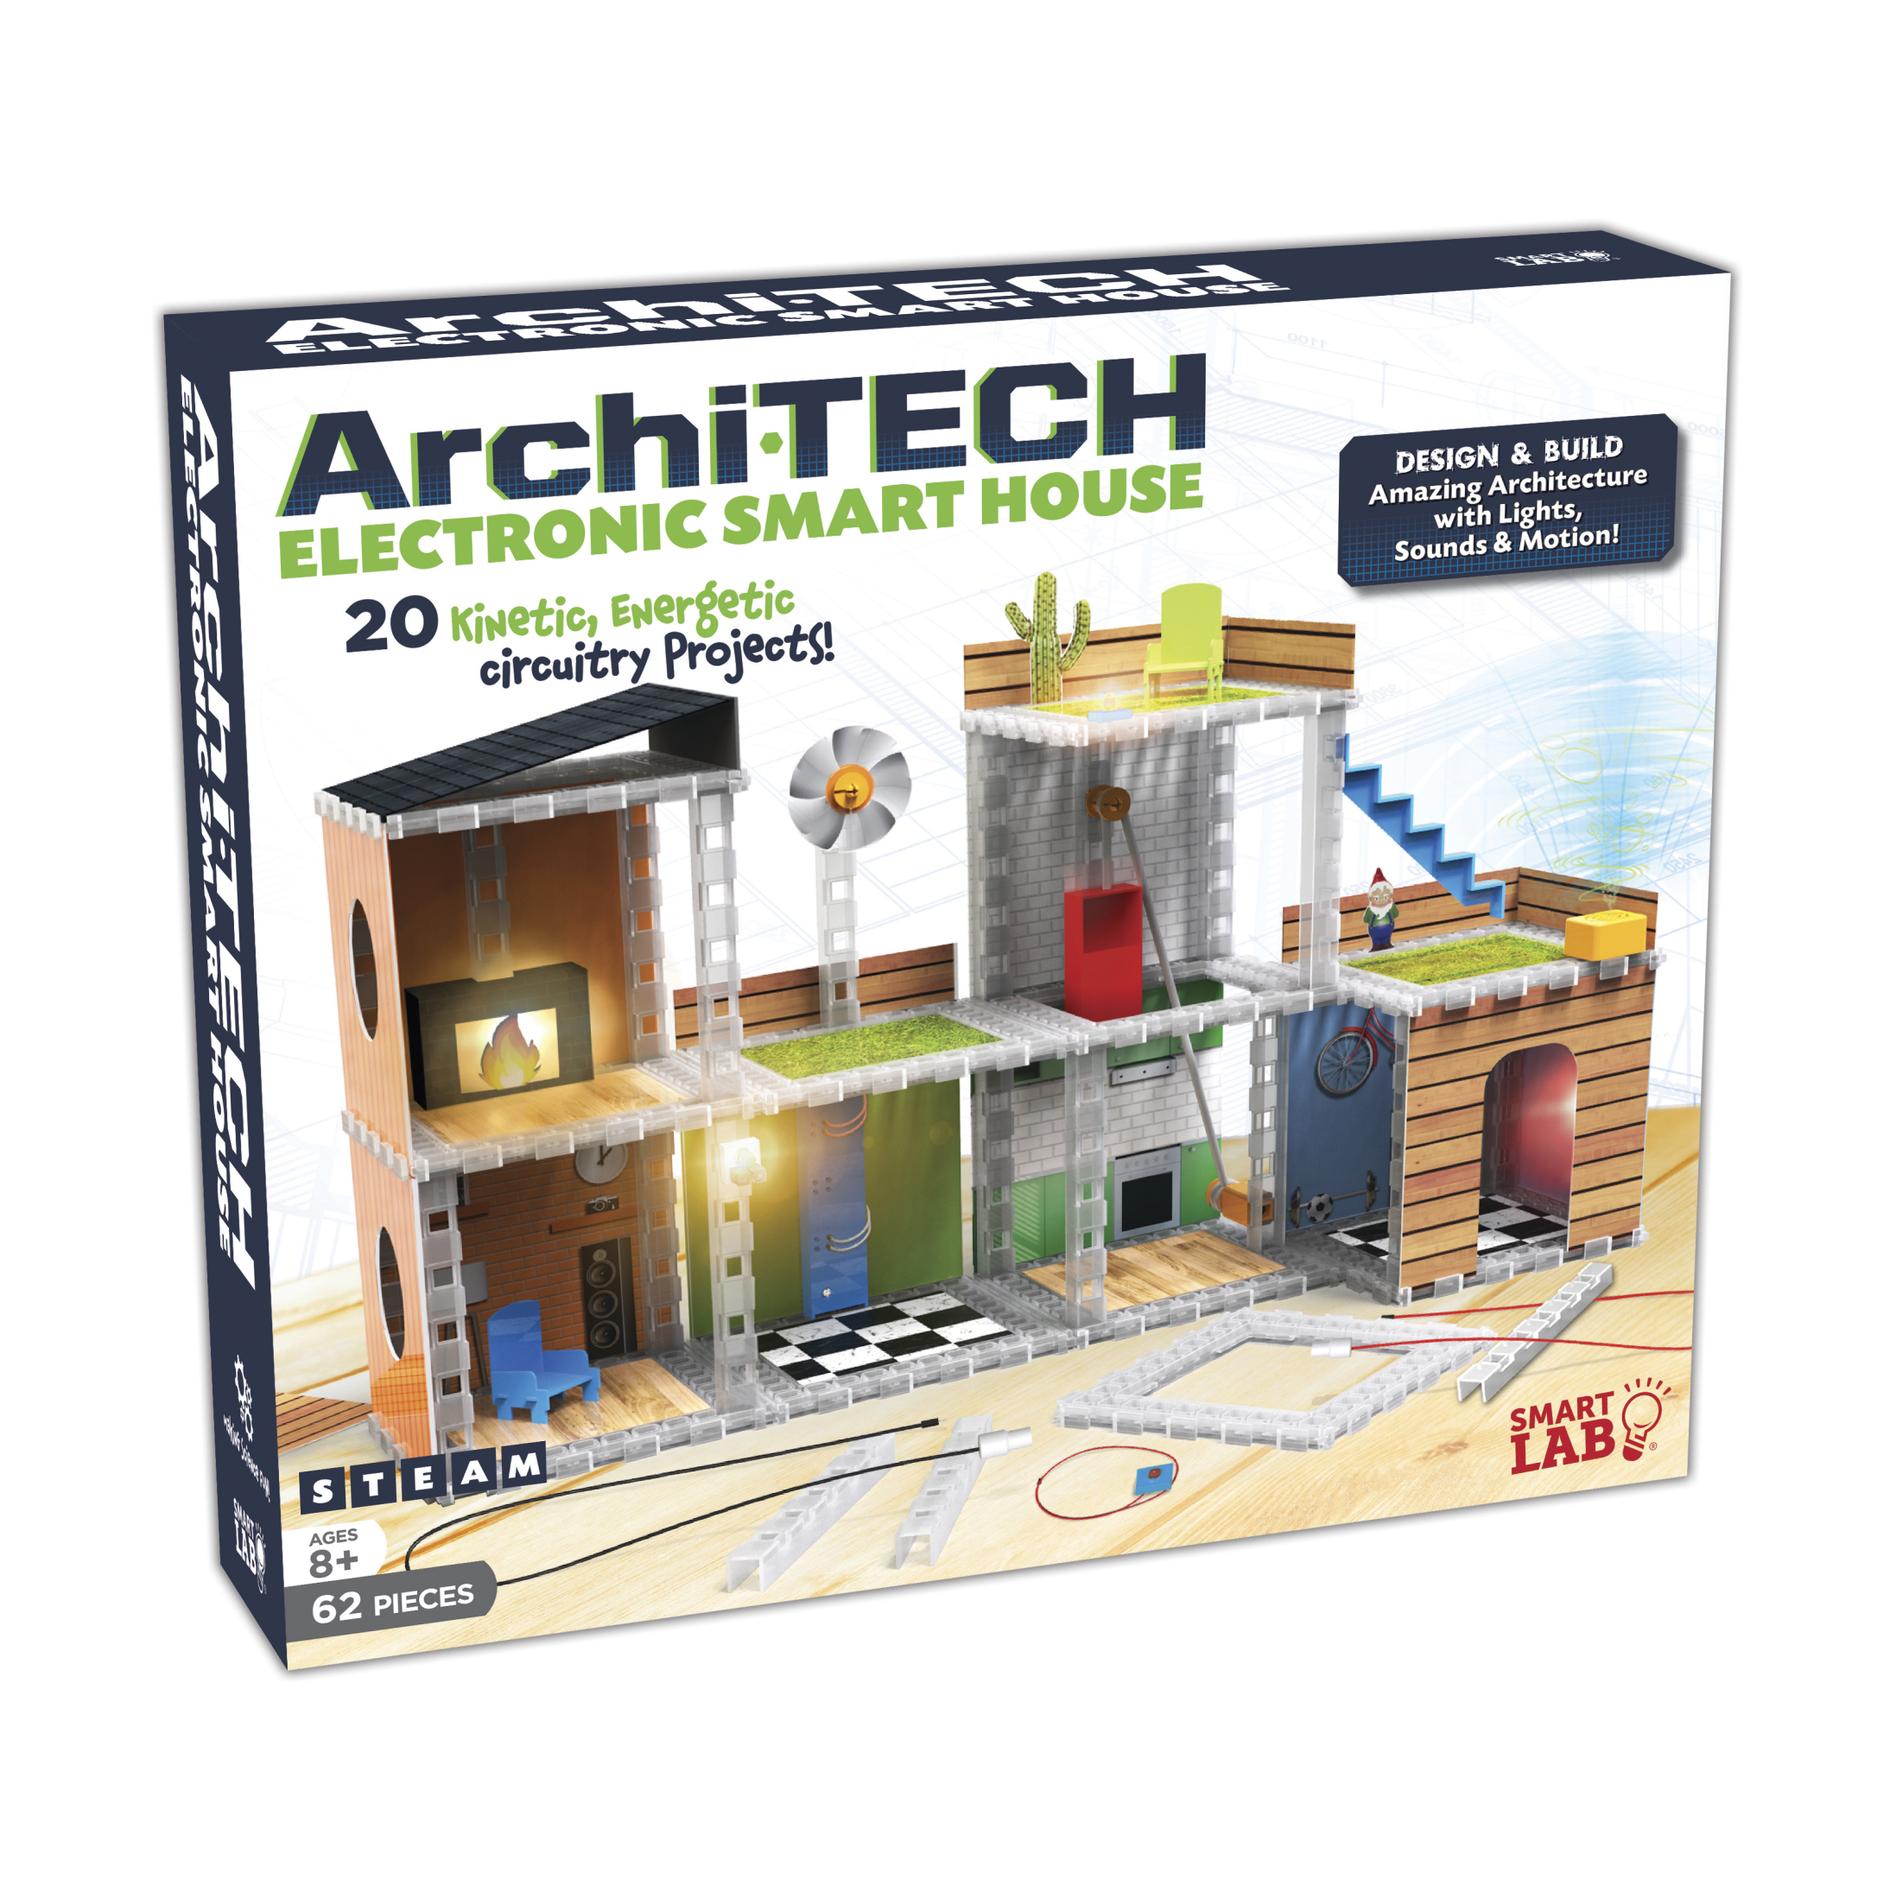 Archi-TECH Electronic Smart House